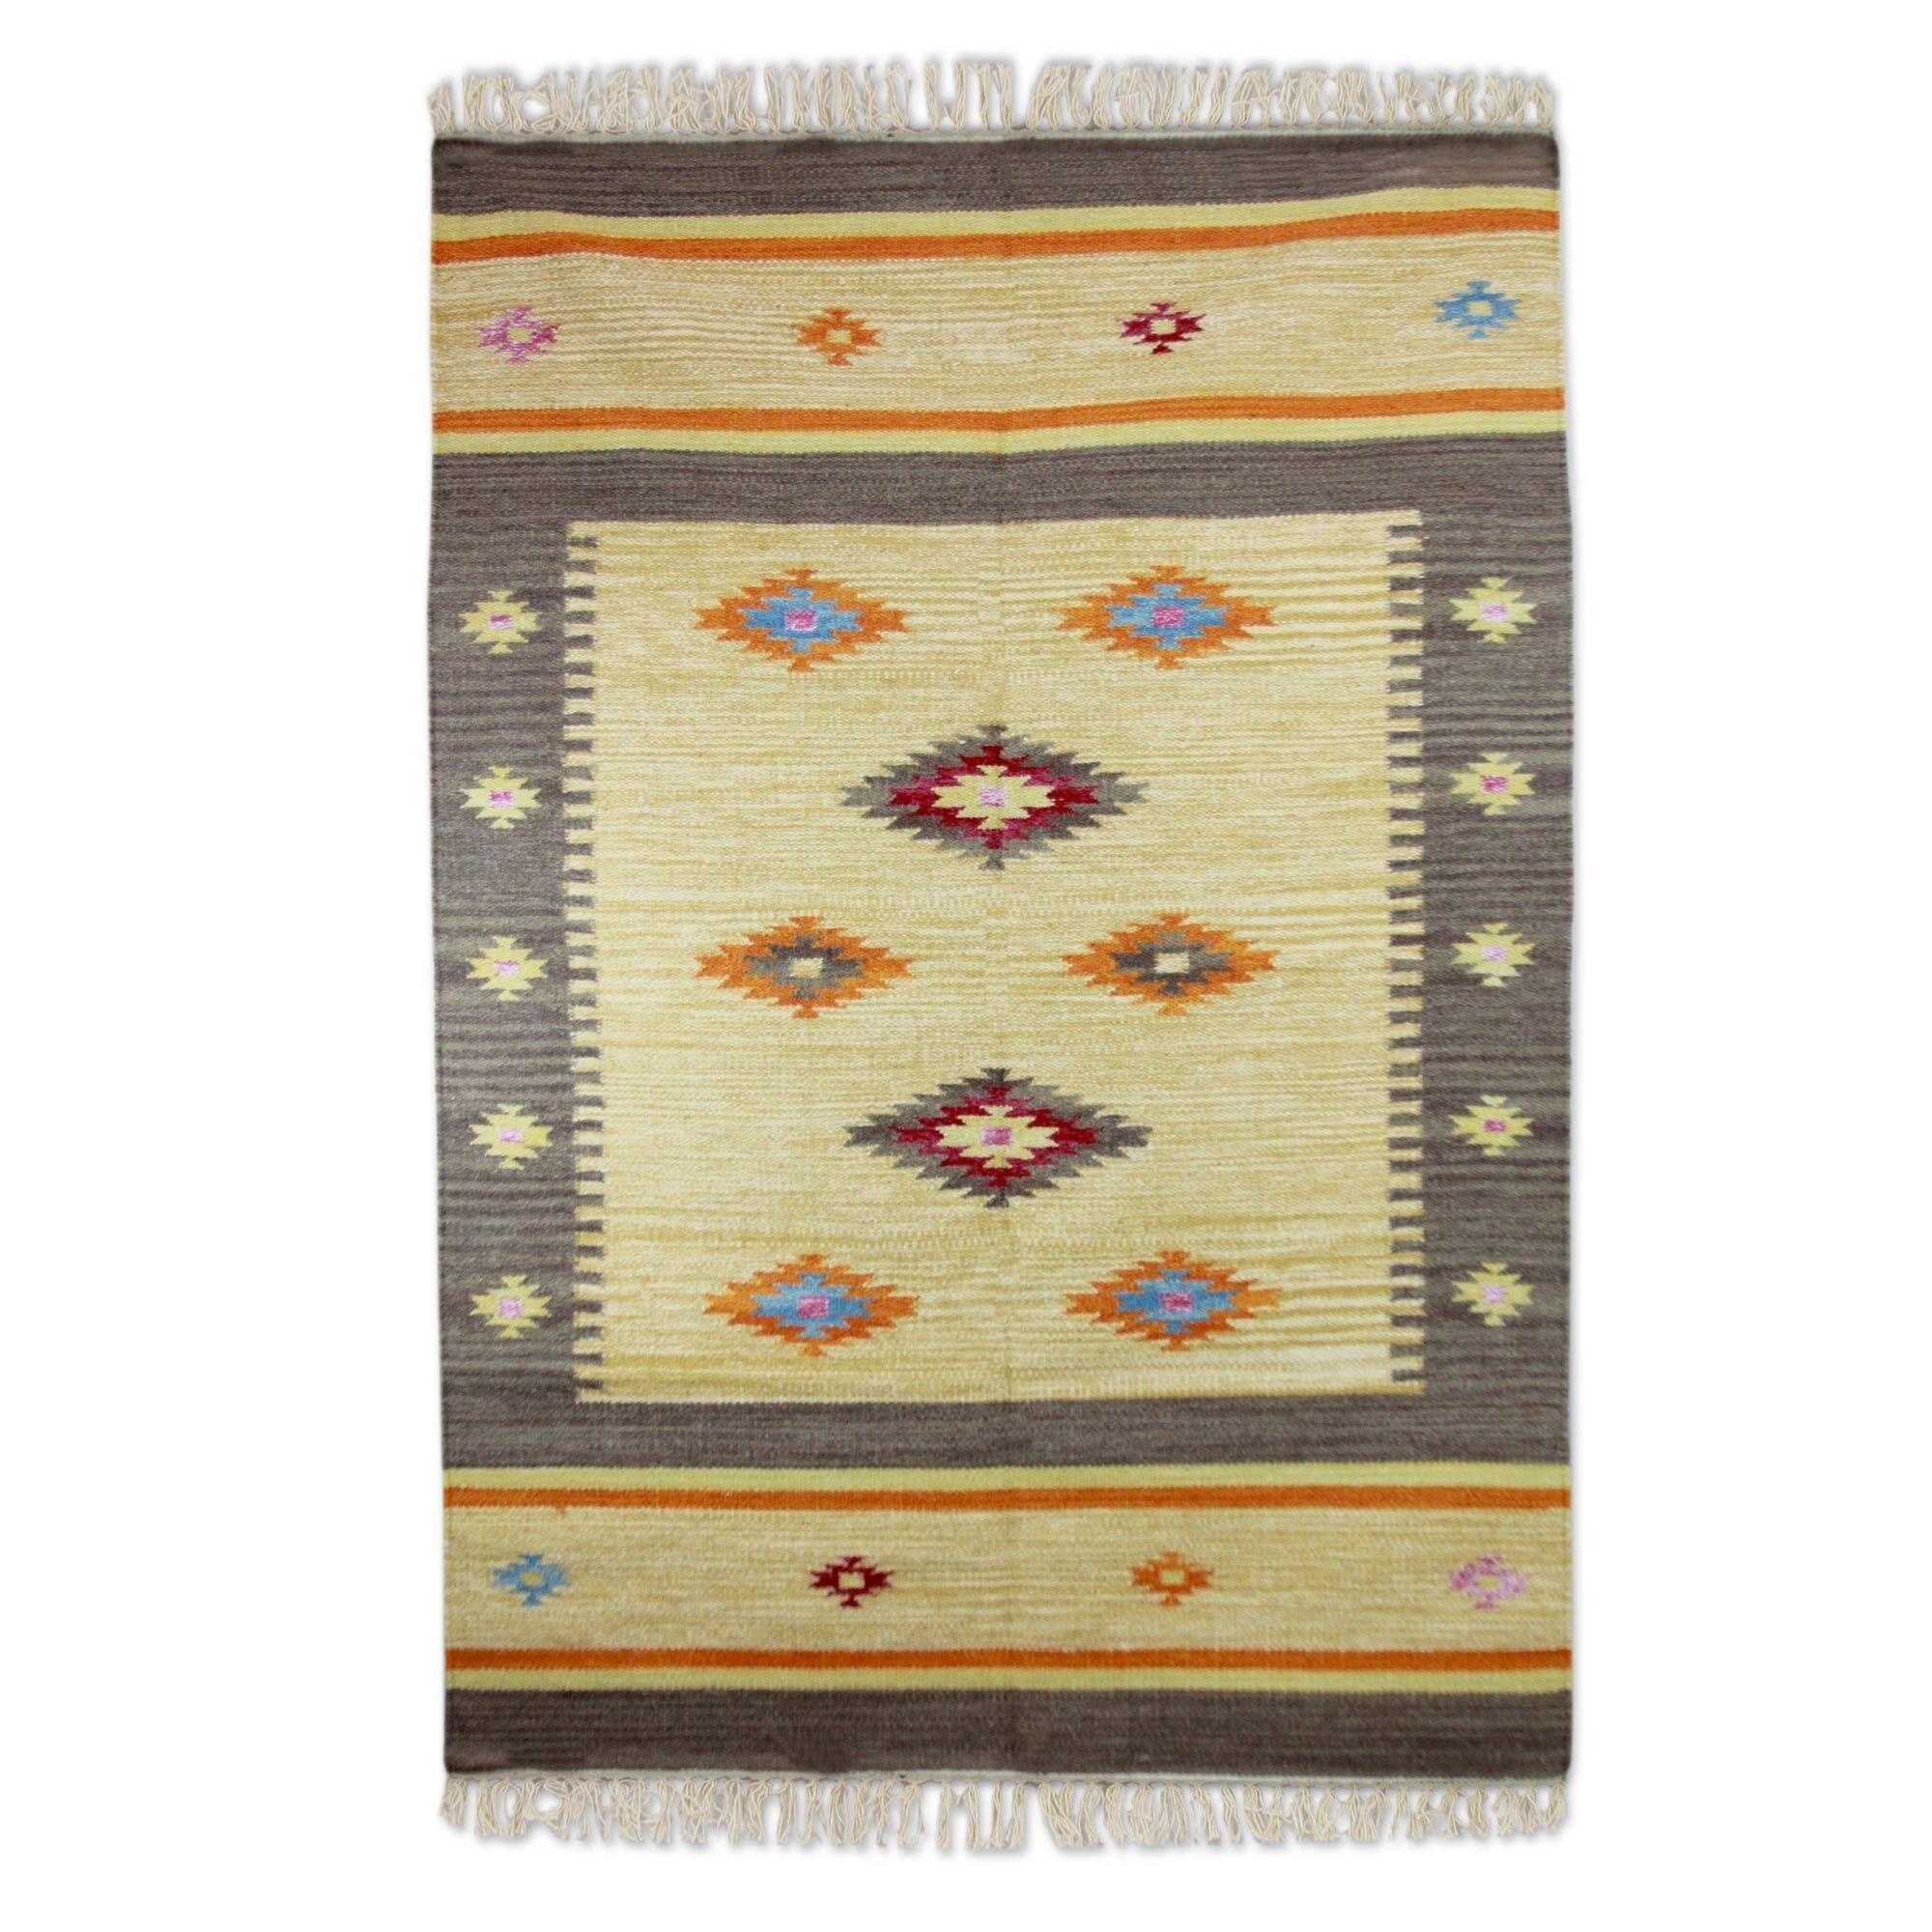 Muldoon Dhurrie Festive Stars Hand-Woven Wool Yellow Area Rug